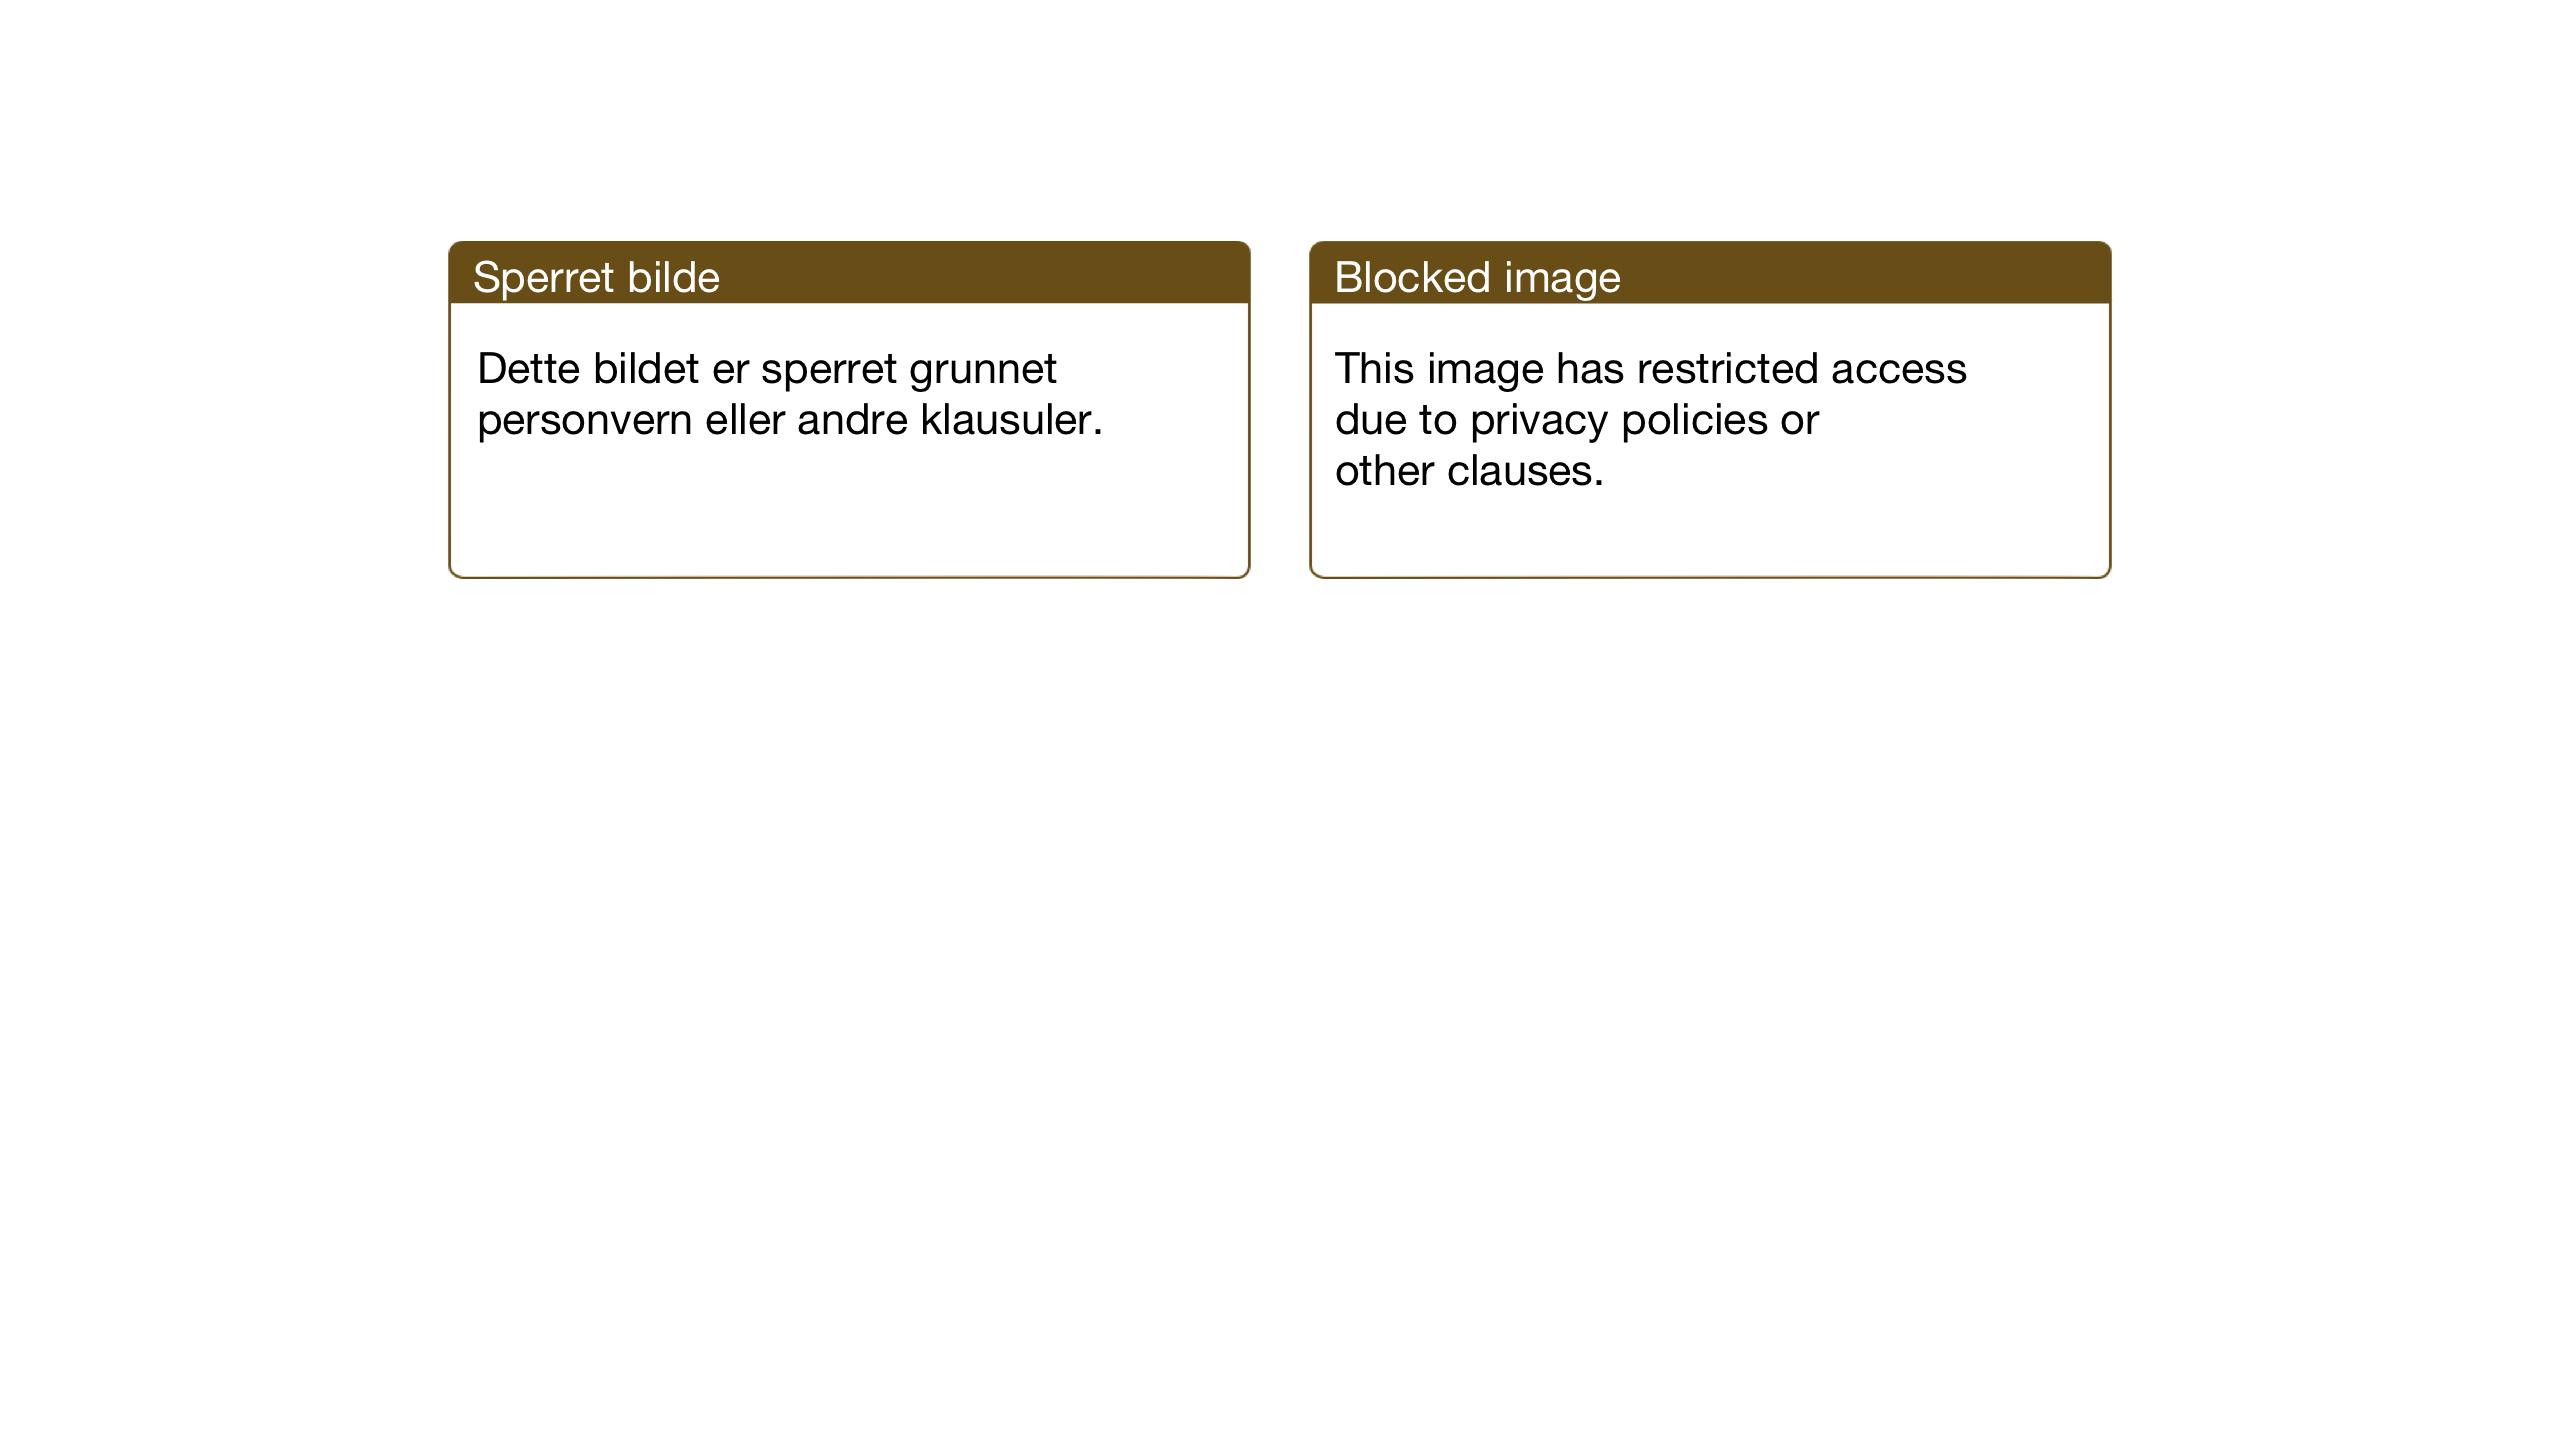 SAH, Vardal prestekontor, H/Ha/Haa/L0018: Ministerialbok nr. 18, 1930-1945, s. 65